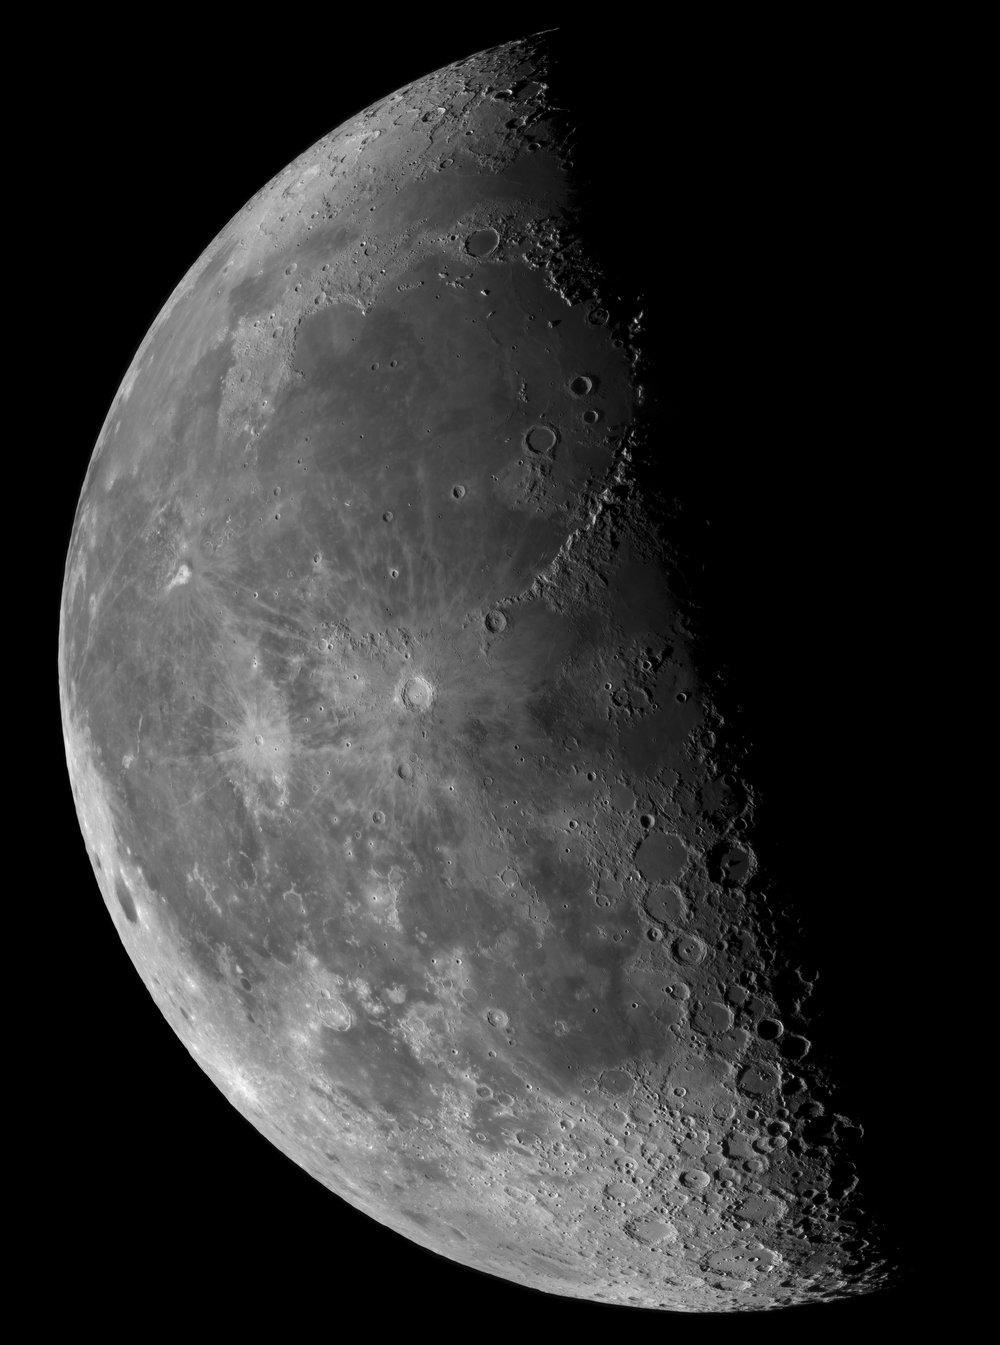 lune-dq-hd-16sep14-sct10i-ir742.jpg